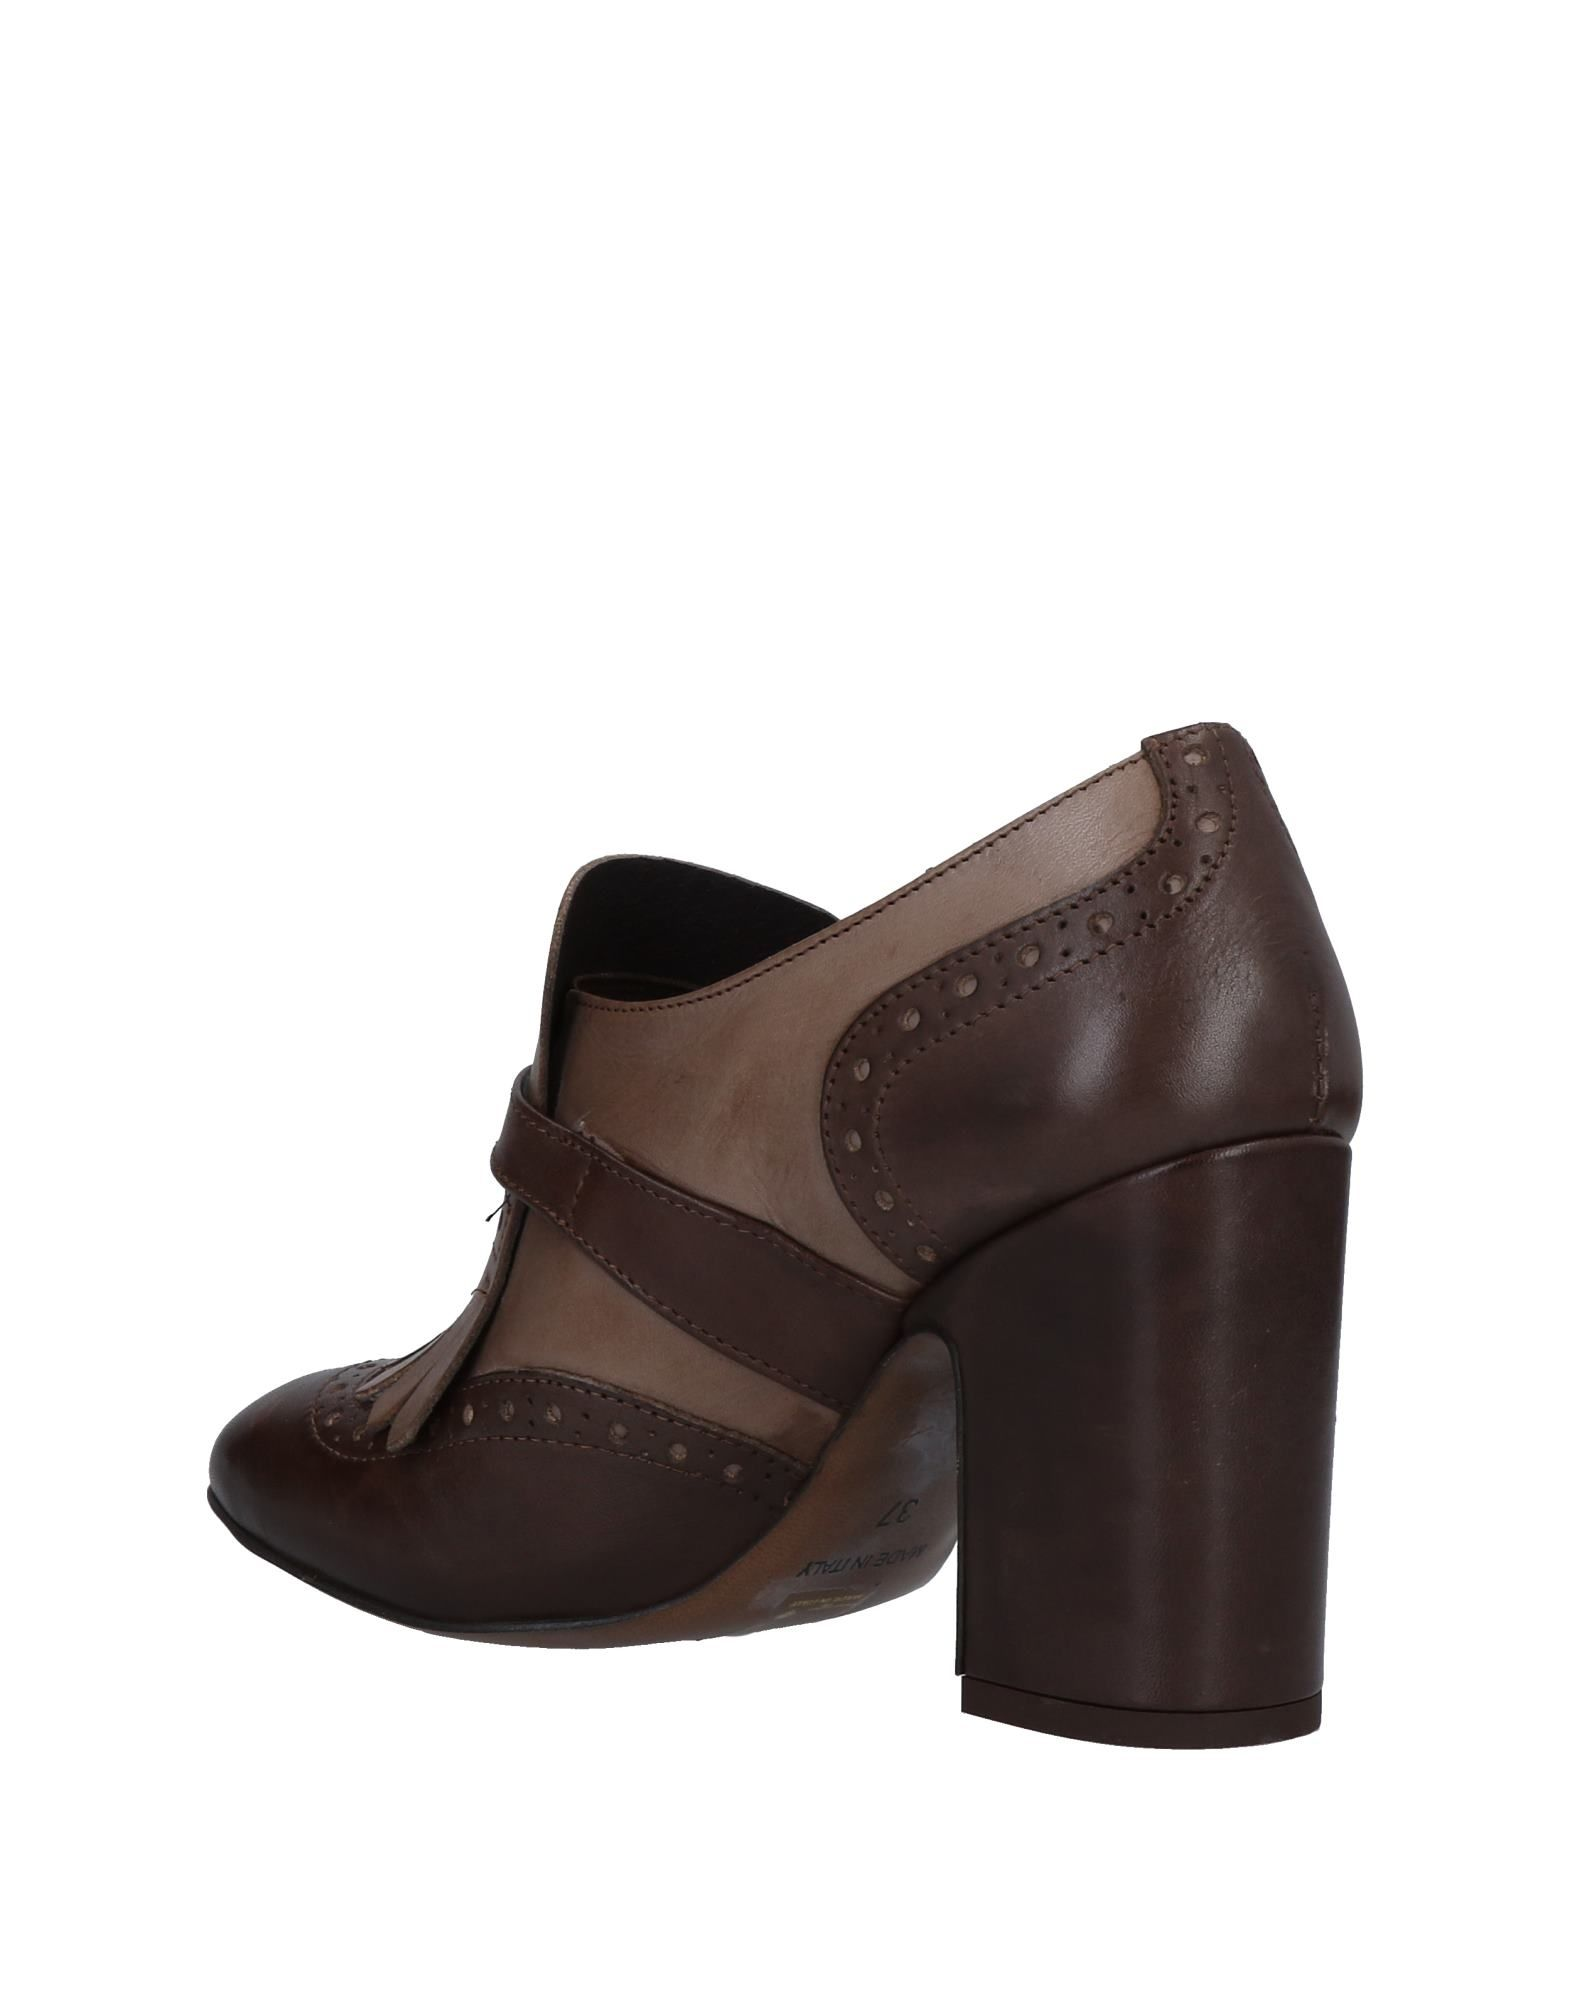 Nila  & Nila Mokassins Damen  Nila 11478772WH Gute Qualität beliebte Schuhe 8d1116